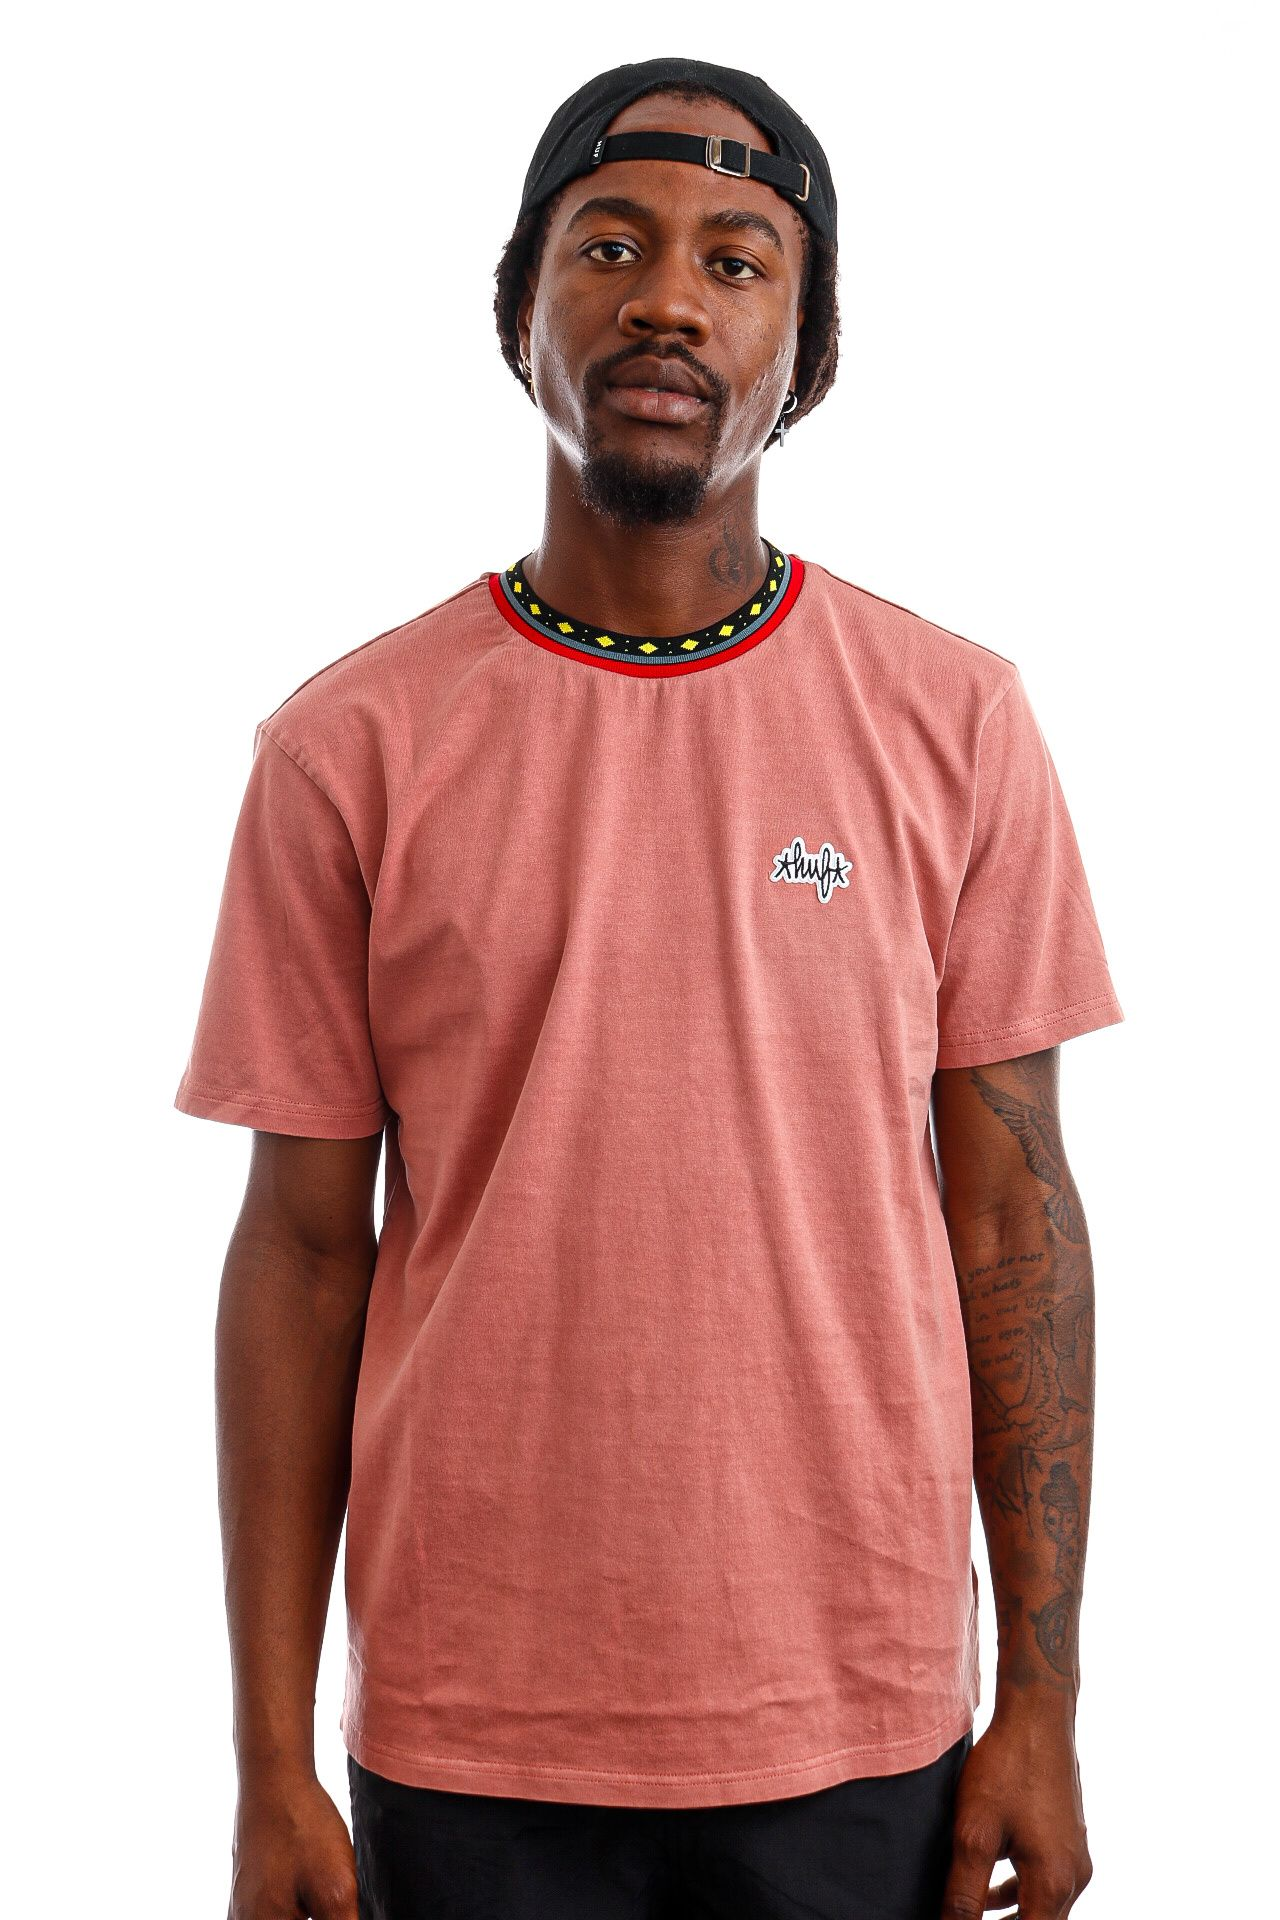 Afbeelding van HUF T-Shirt HUF TOBIAS S/S KNIT Dusty Rose KN00288